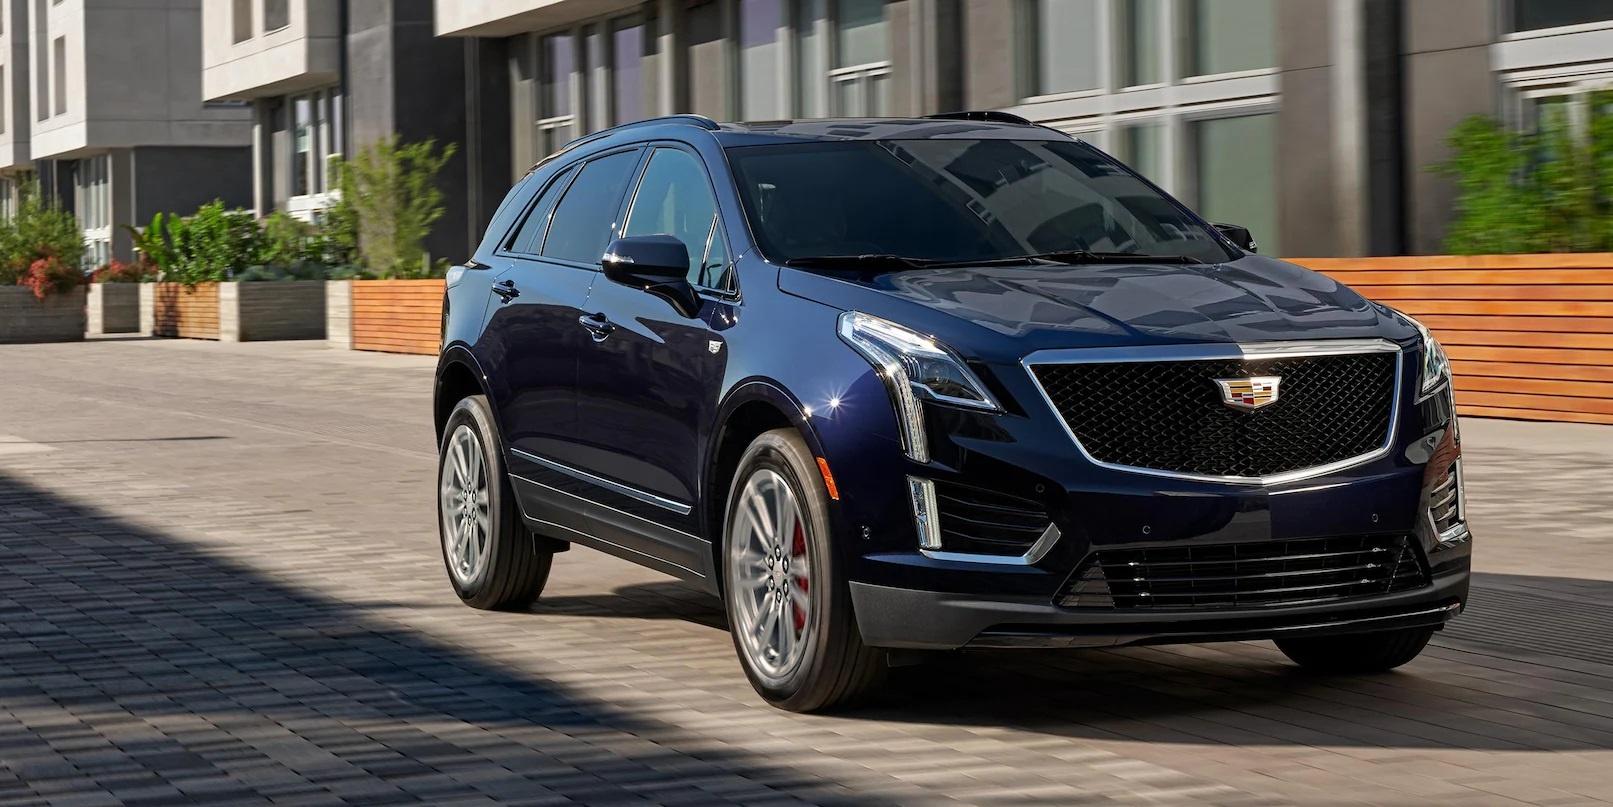 2022 Cadillac XT5